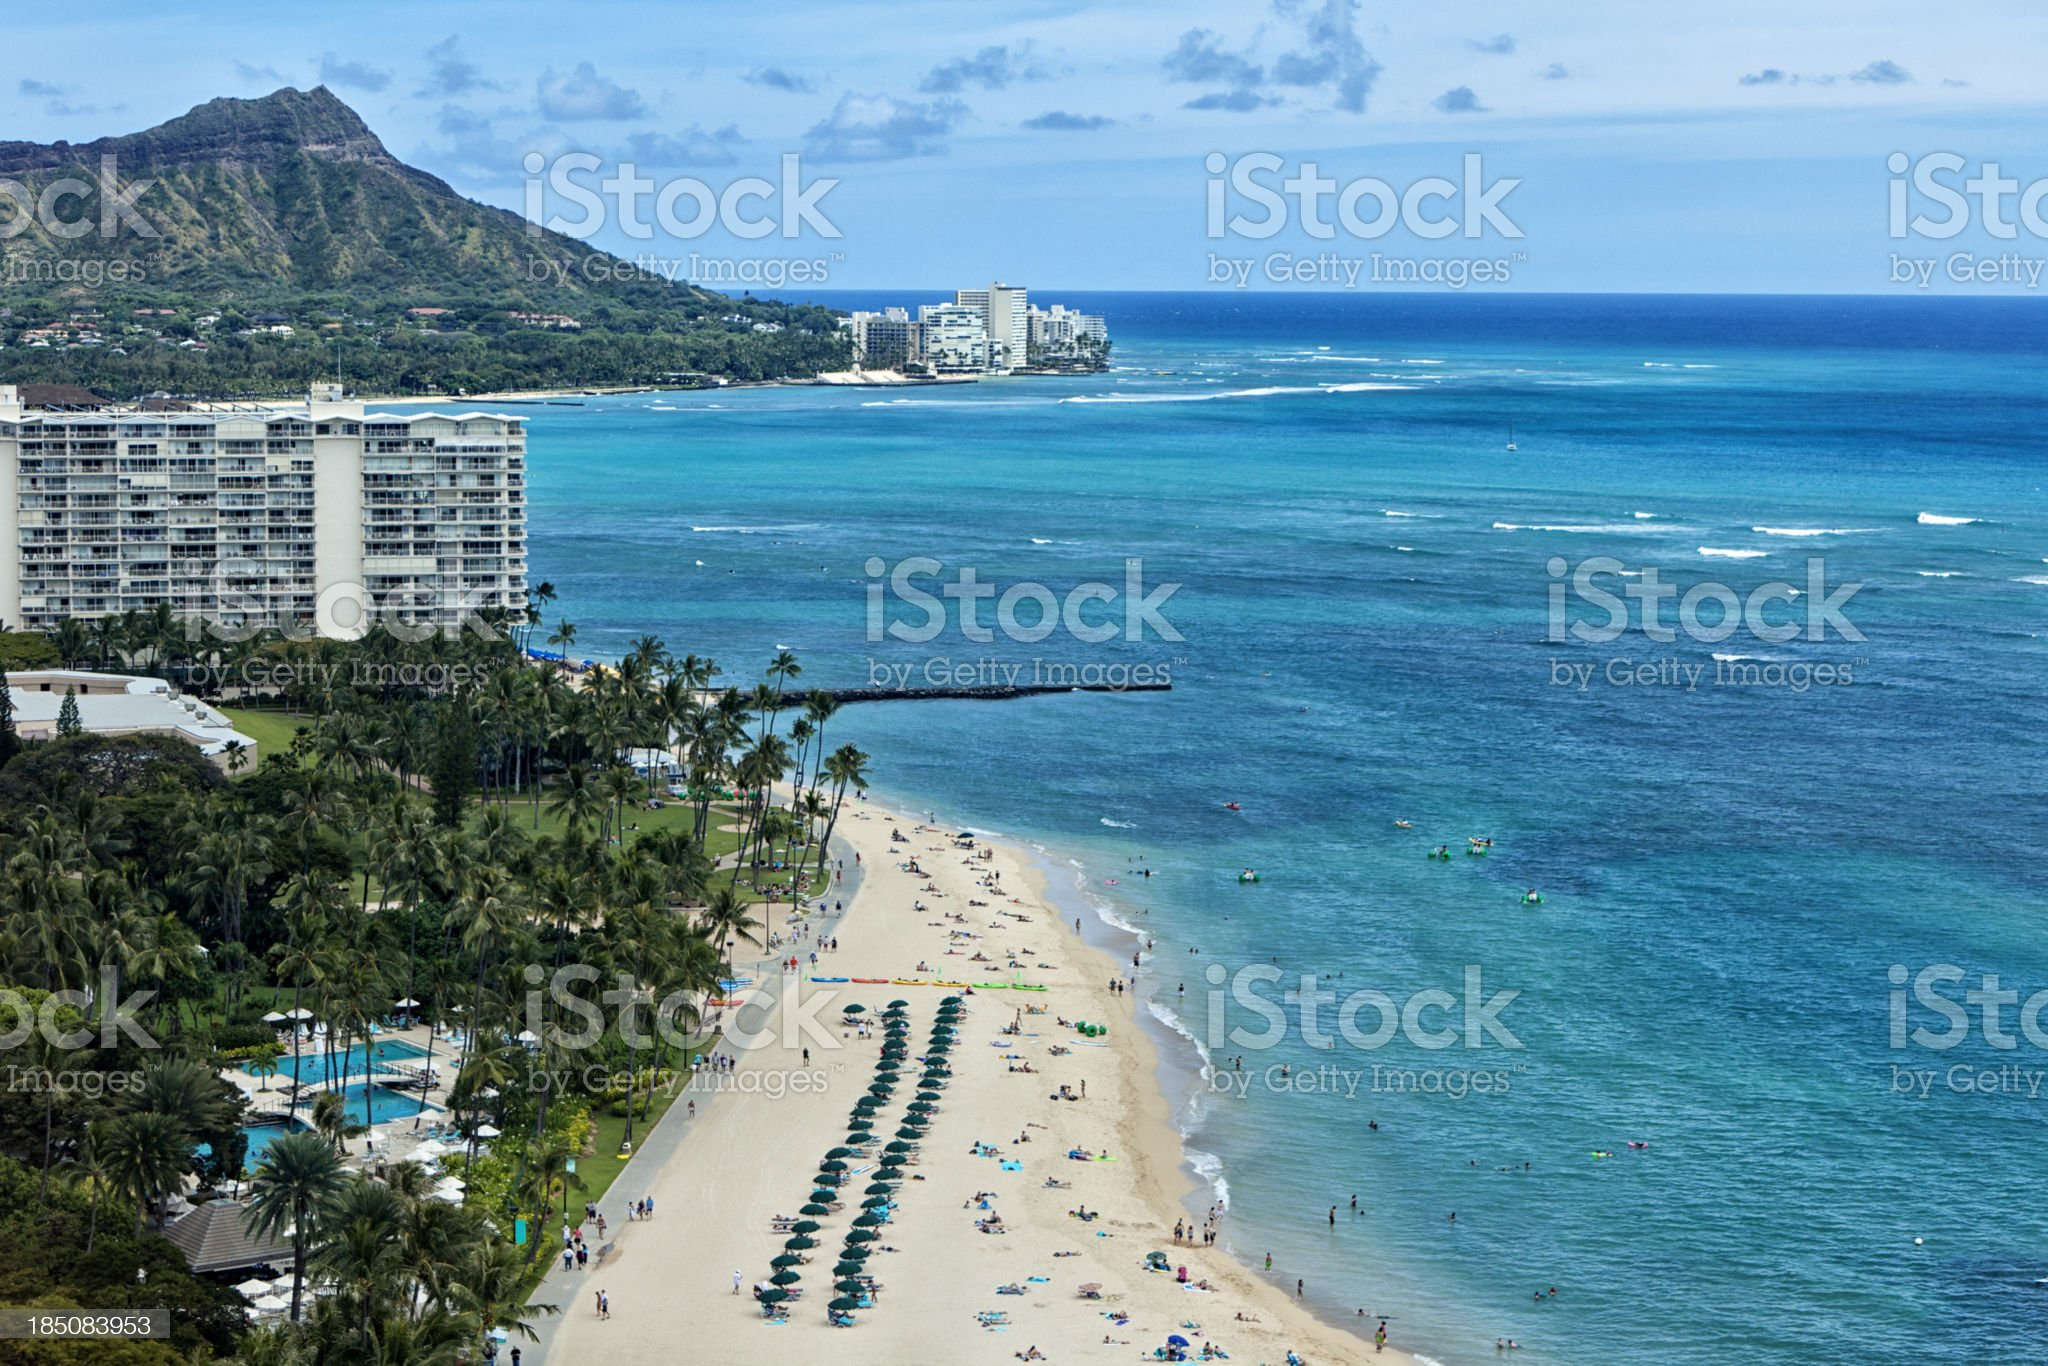 Waikiki Beach Aerial View royalty-free stock photo